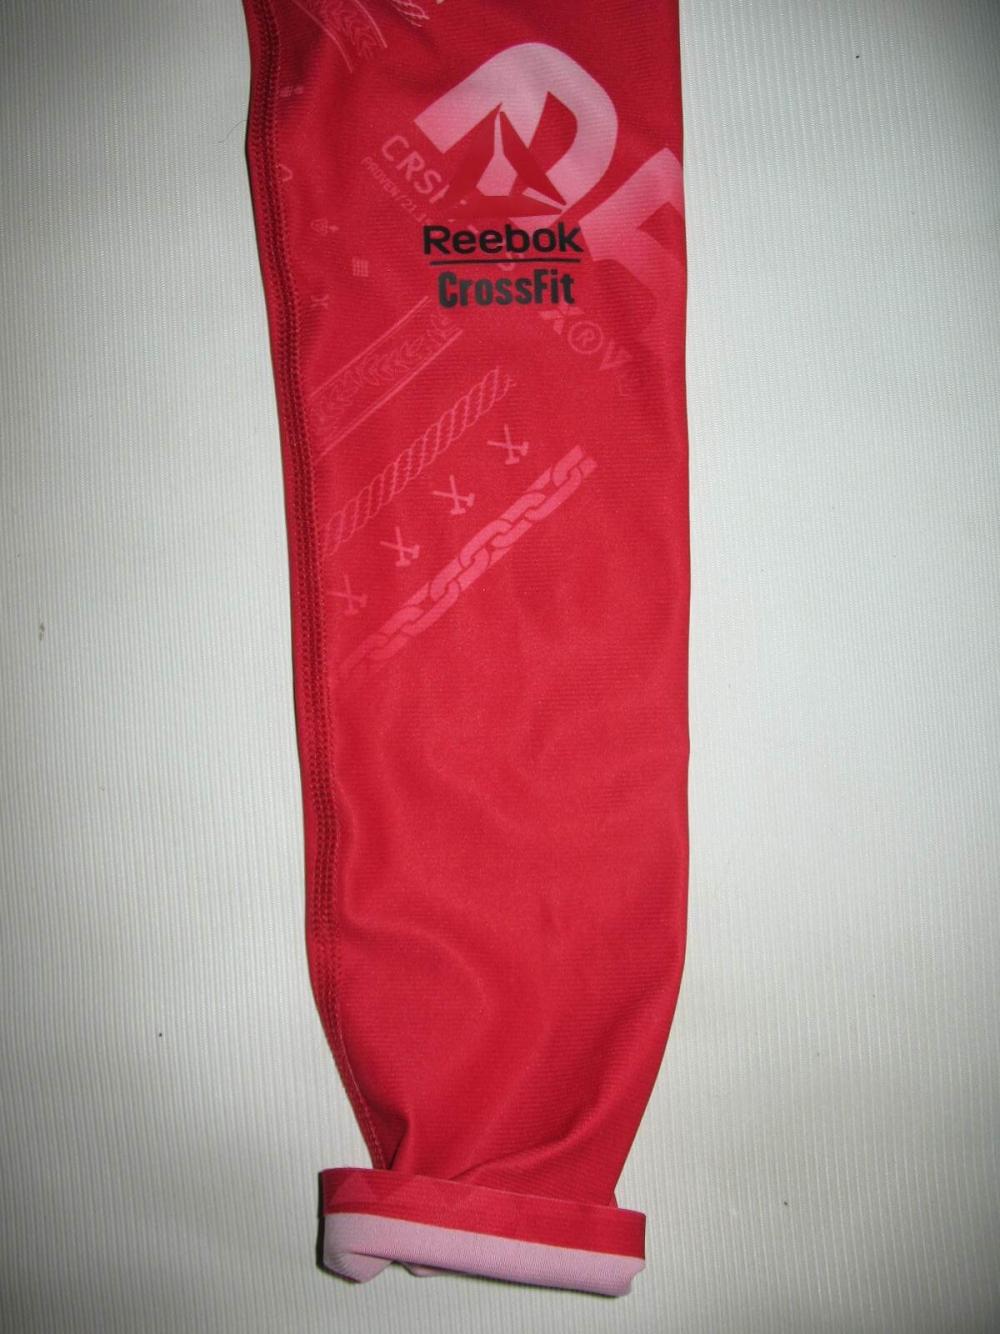 Штаны REEBOK crossFit PWR5 compression training tight leggings (размер M/S) - 10